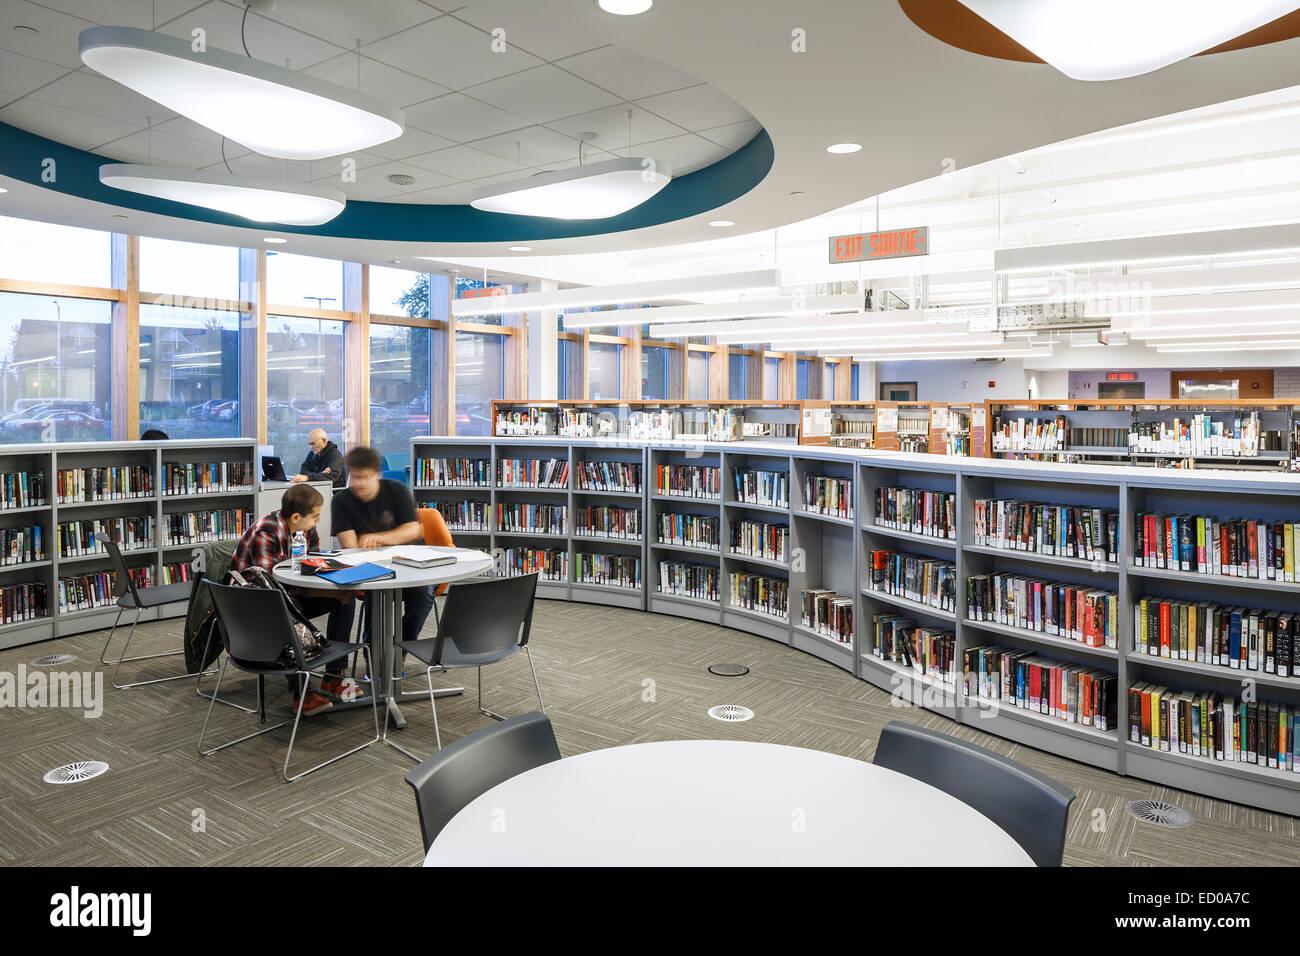 Ottawa Public Library Room